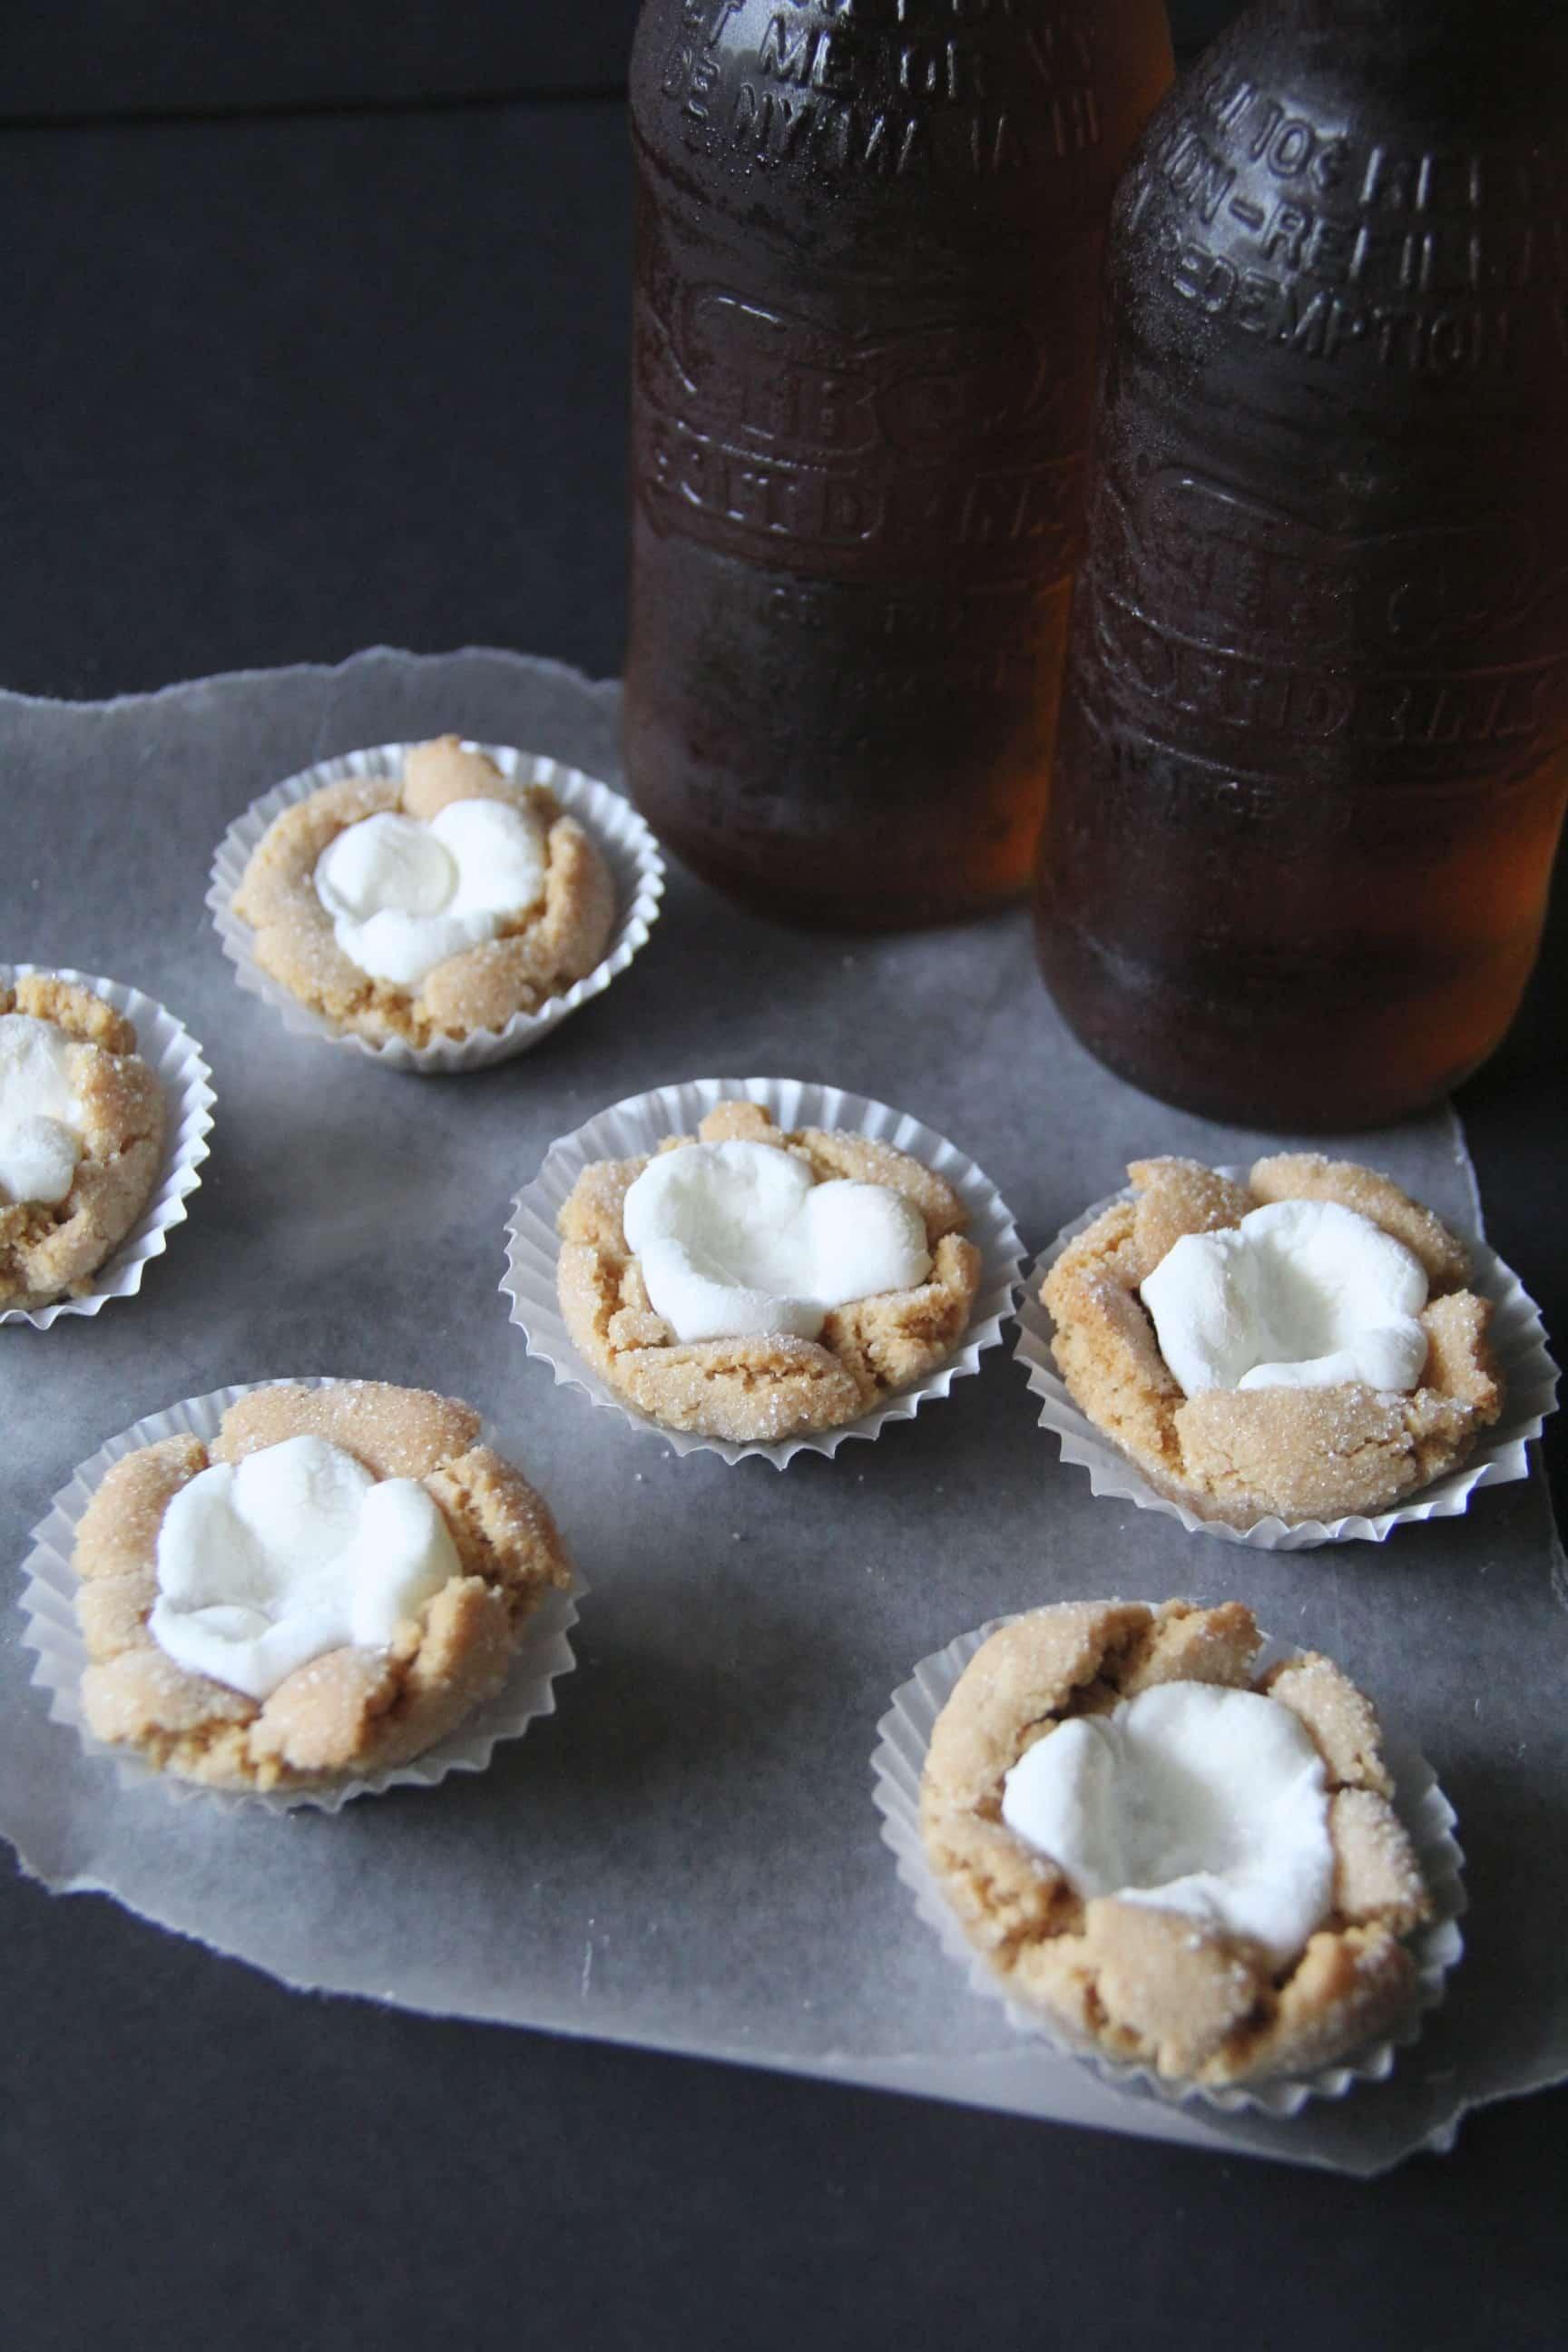 Marshmallow Cookies with Cream Soda